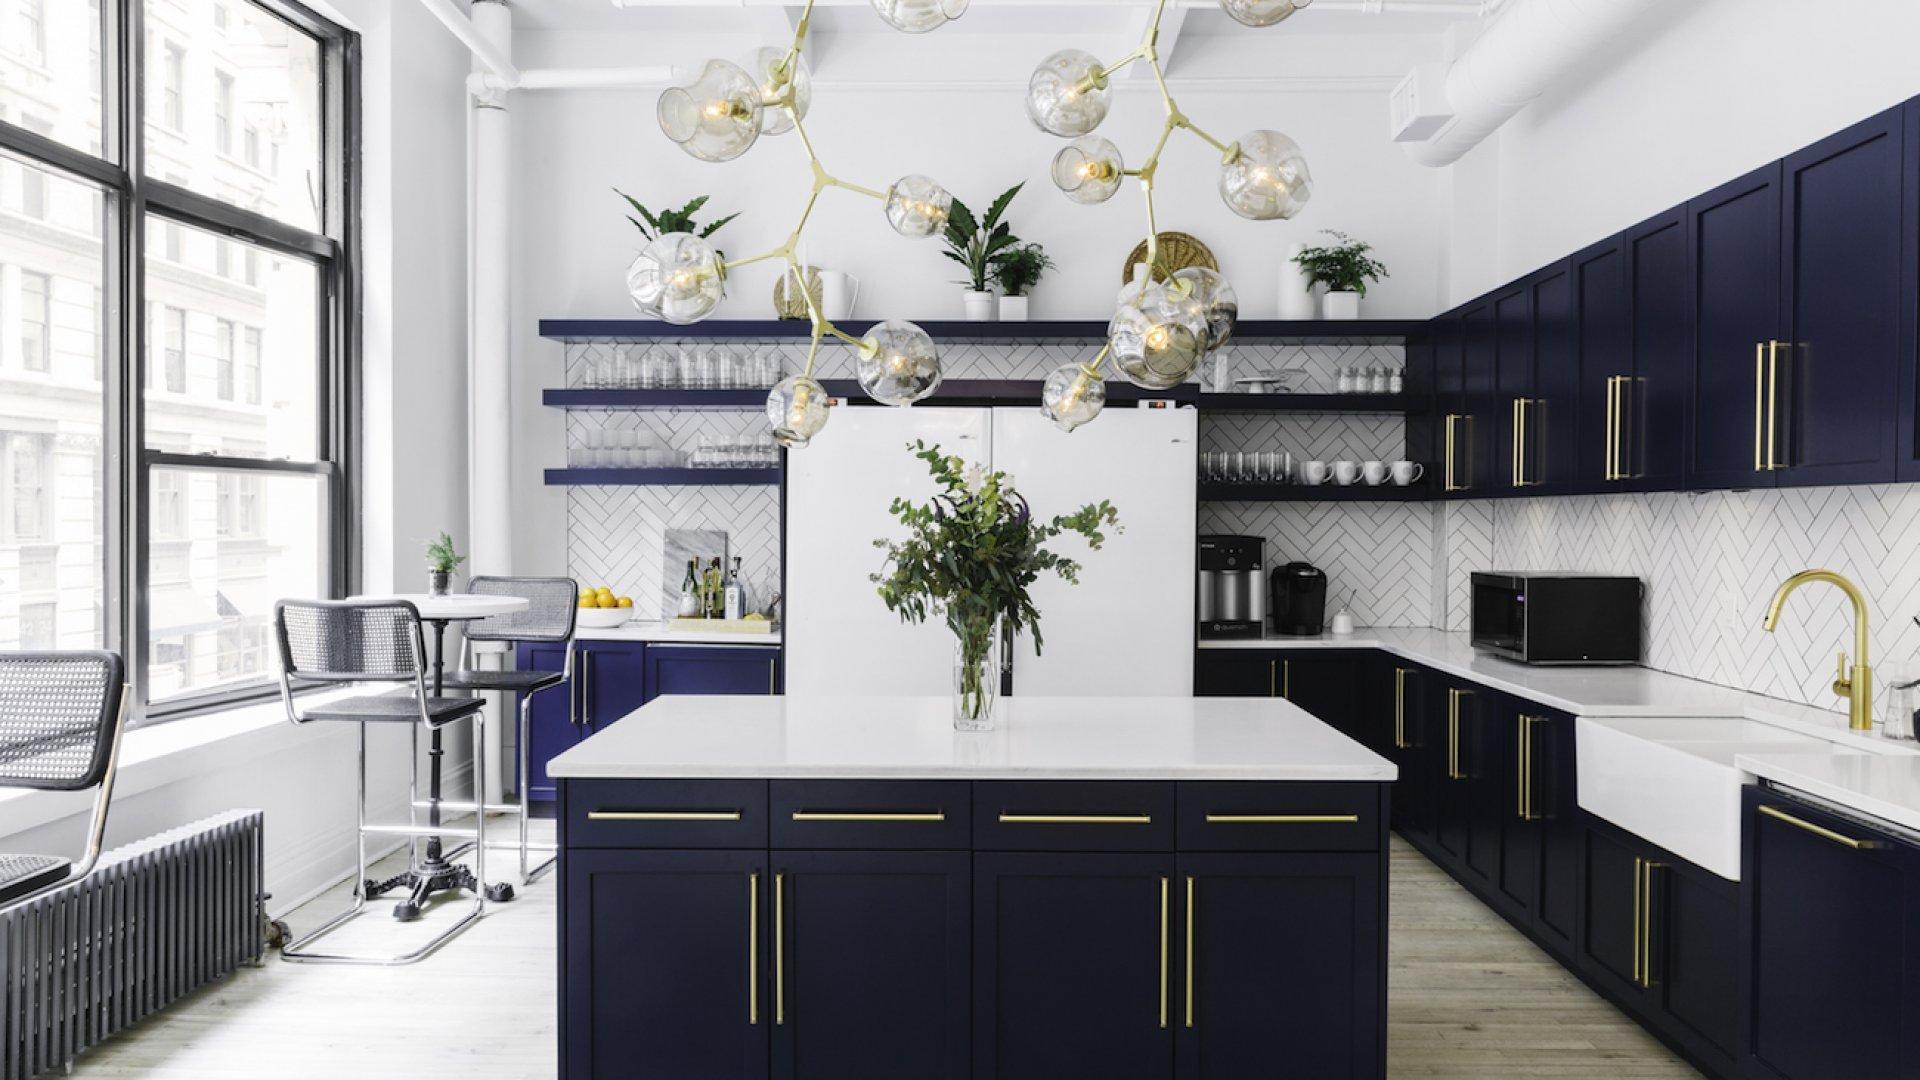 The Homepolish office kitchen.